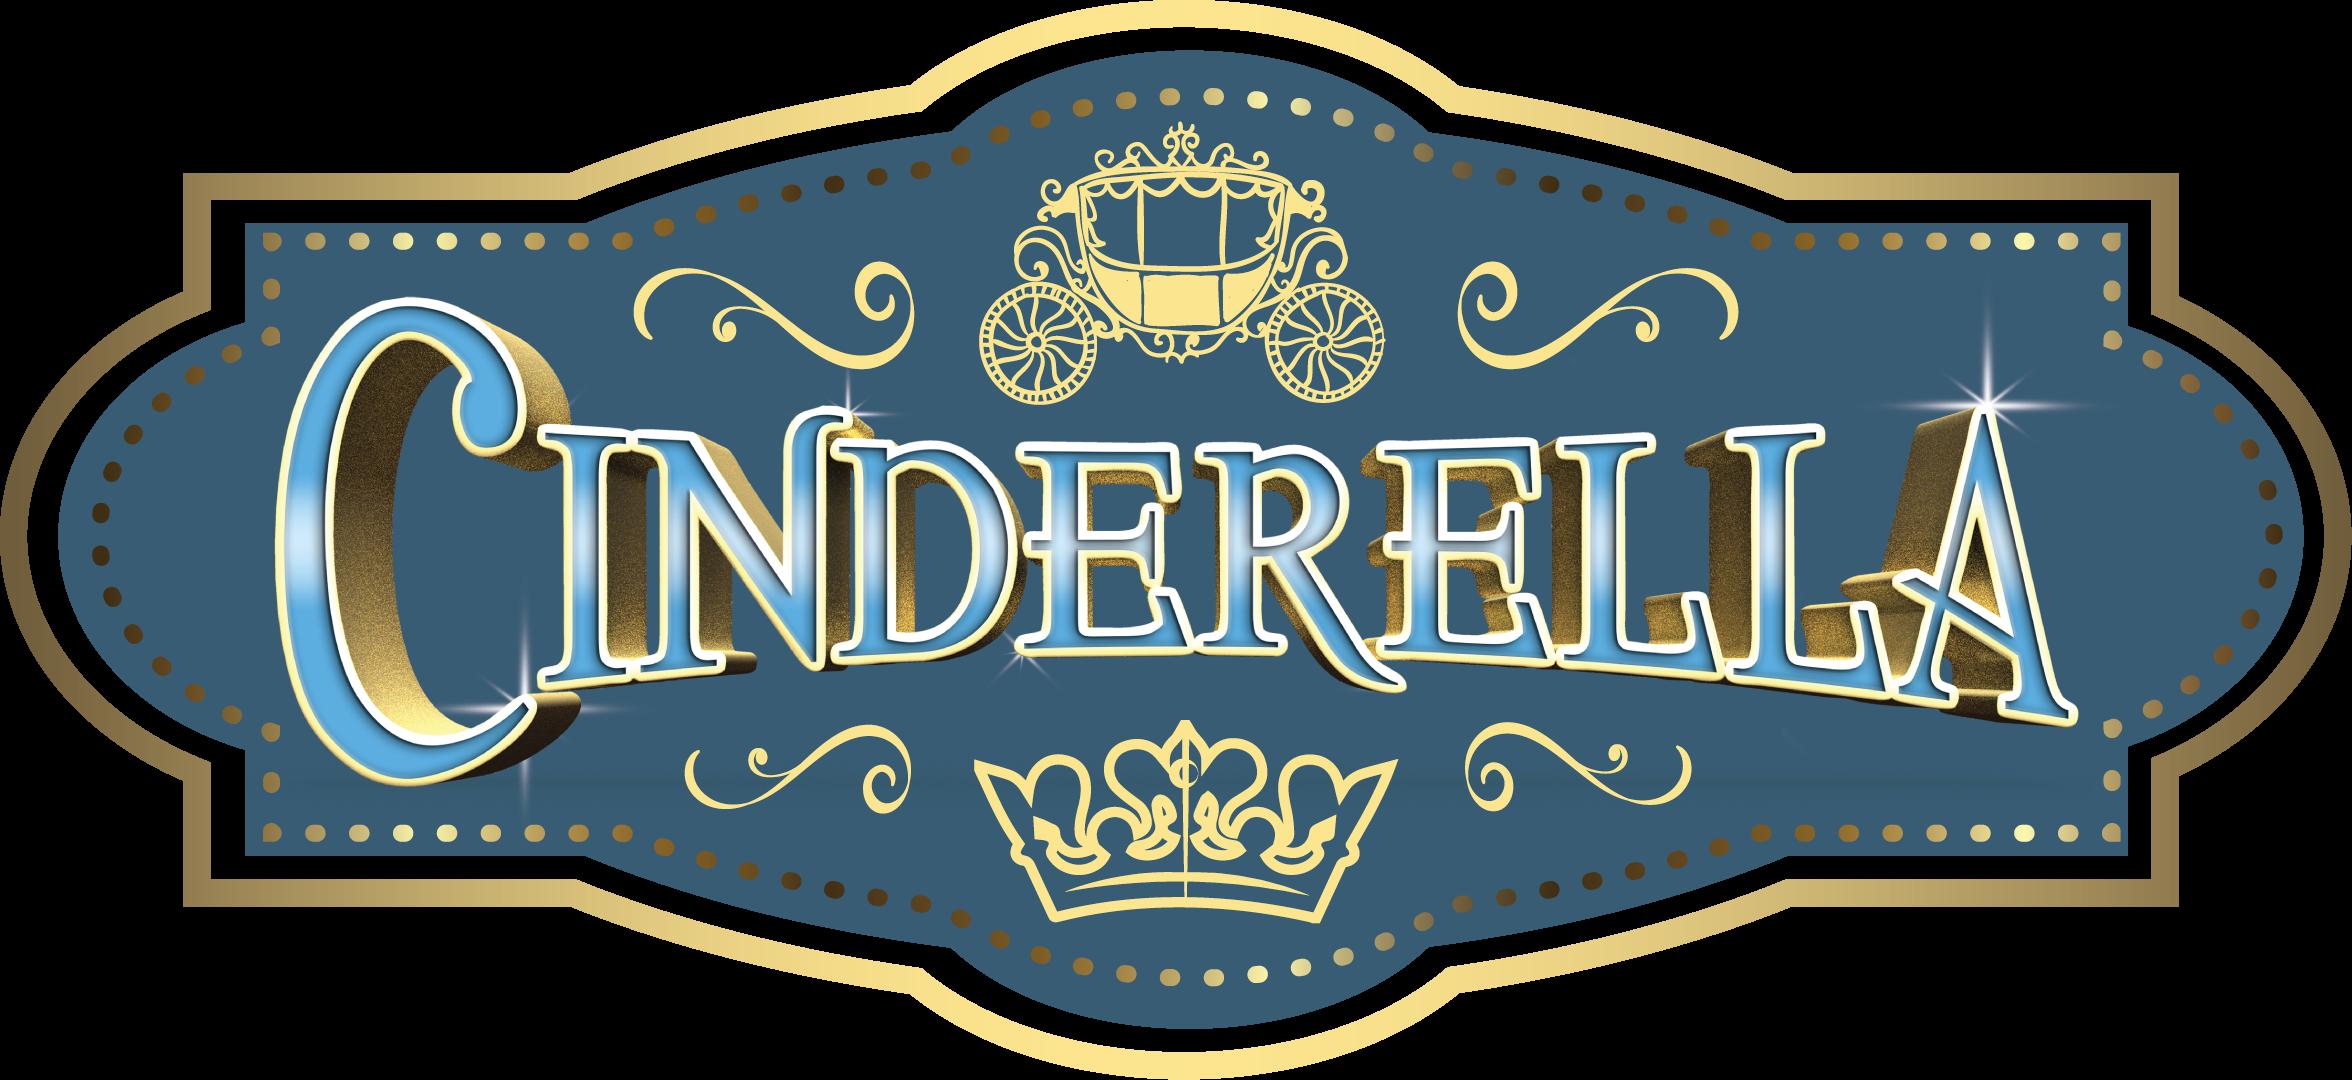 Cinderella PNG HD - PNG HD Of Cinderella